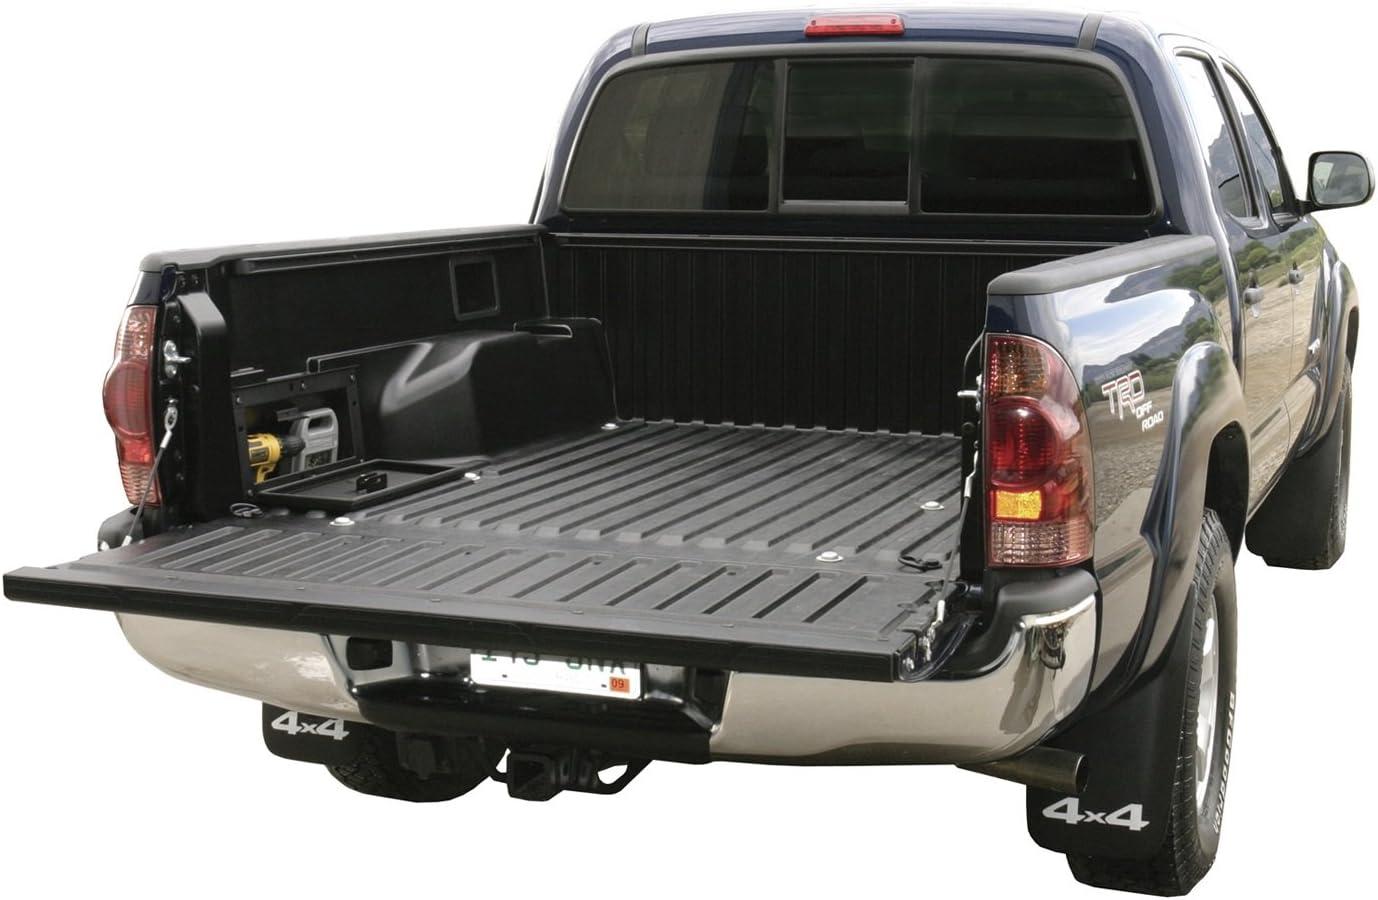 Black Toyota Tacoma Truck Bed Security Lockbox